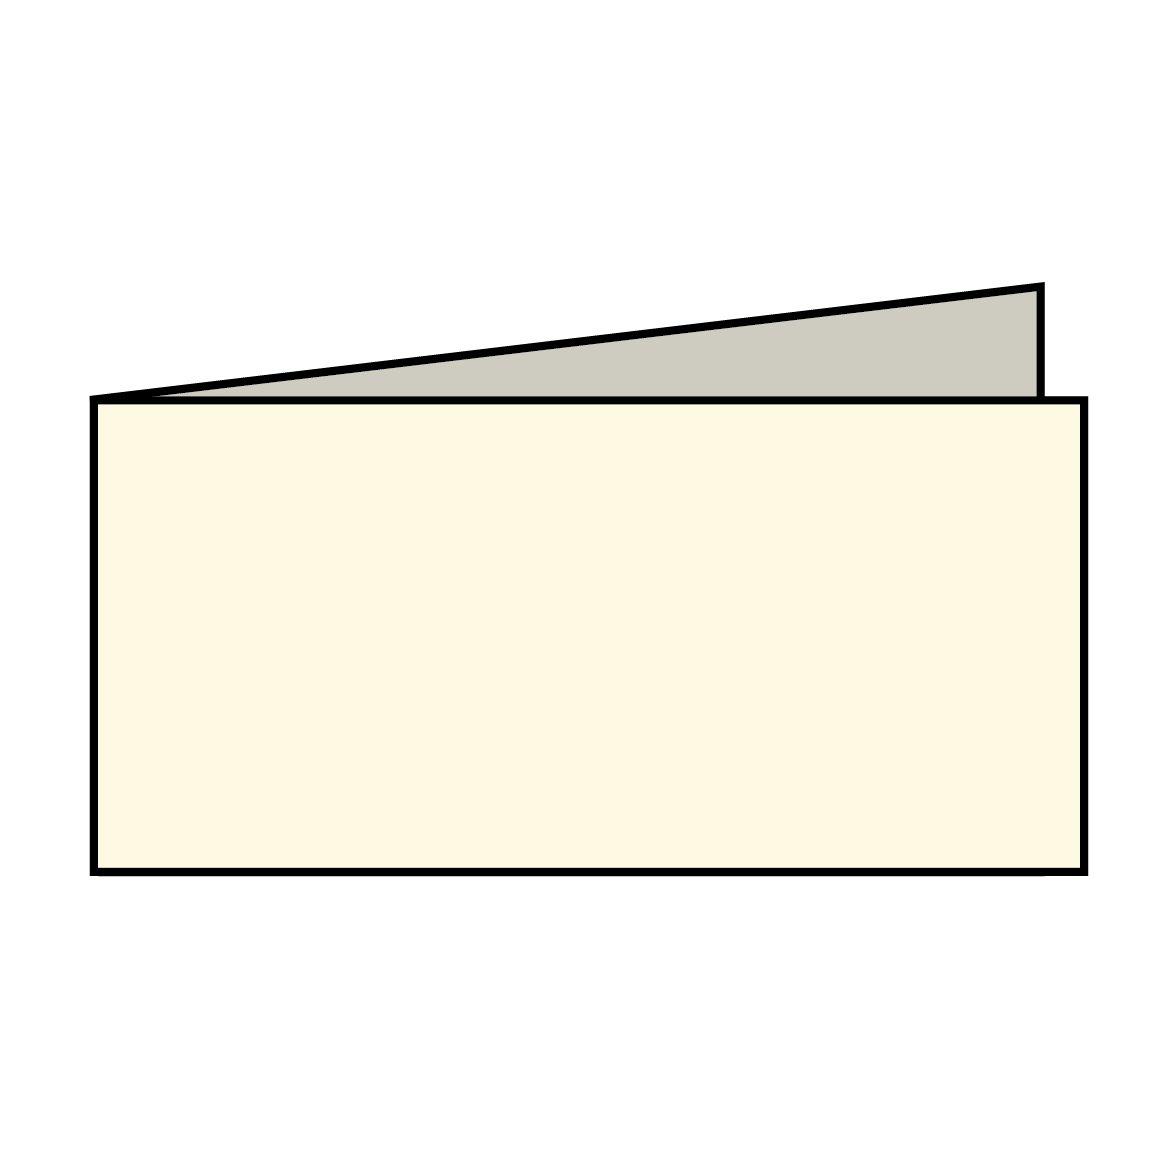 Rössler Papier - - Paperado-Karte DL ld, candle light B07CX8CB33 | Eleganter Stil